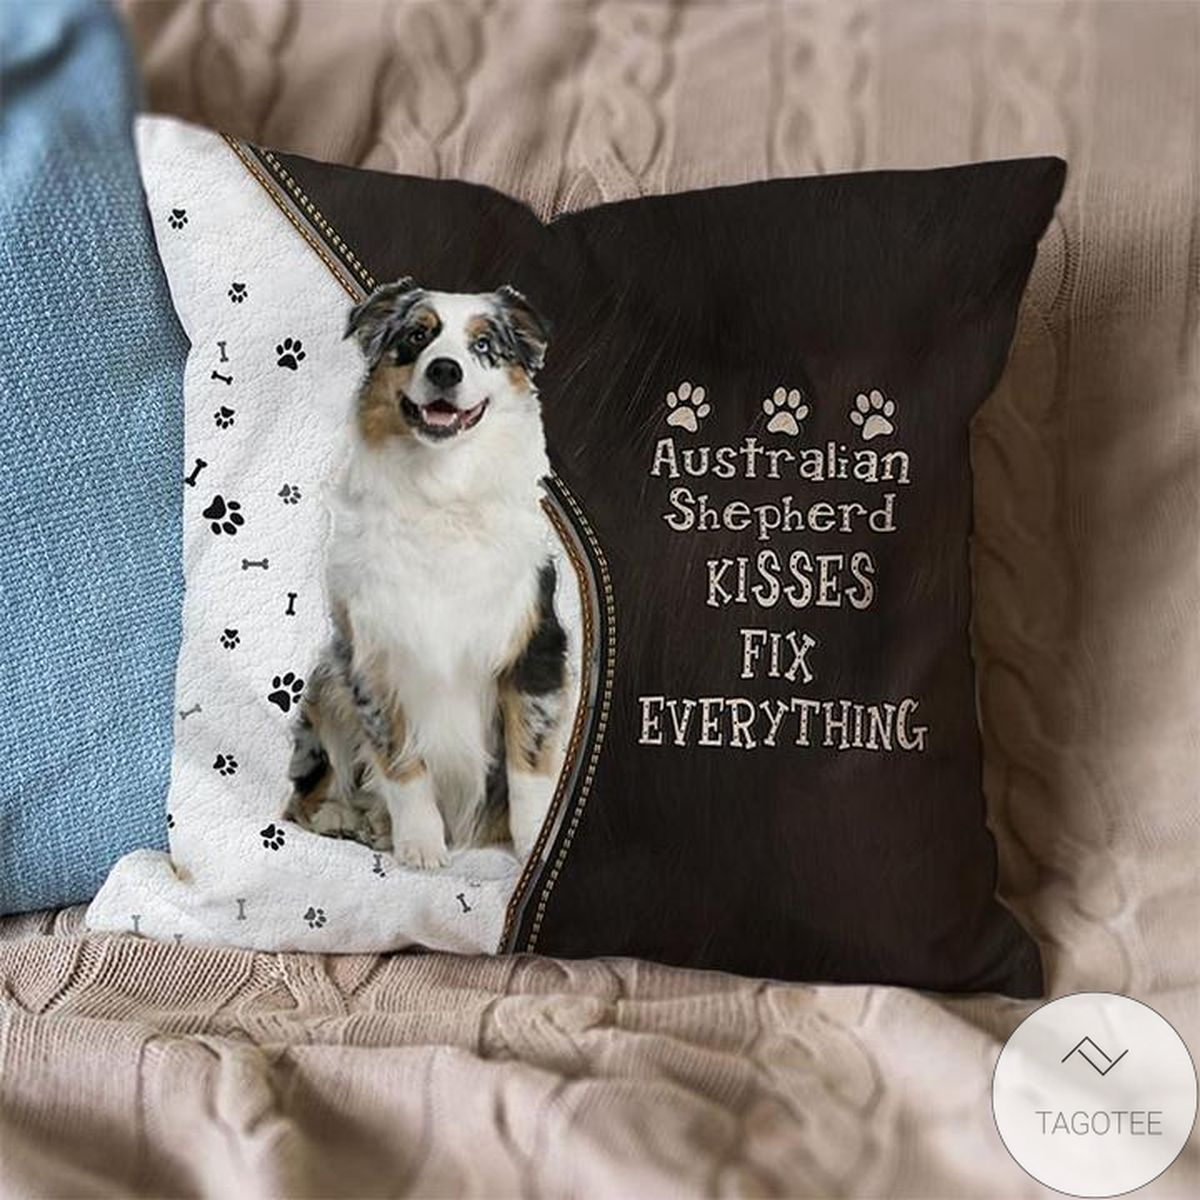 Australian Shepherd Kisses Fix Everything Pillowcase